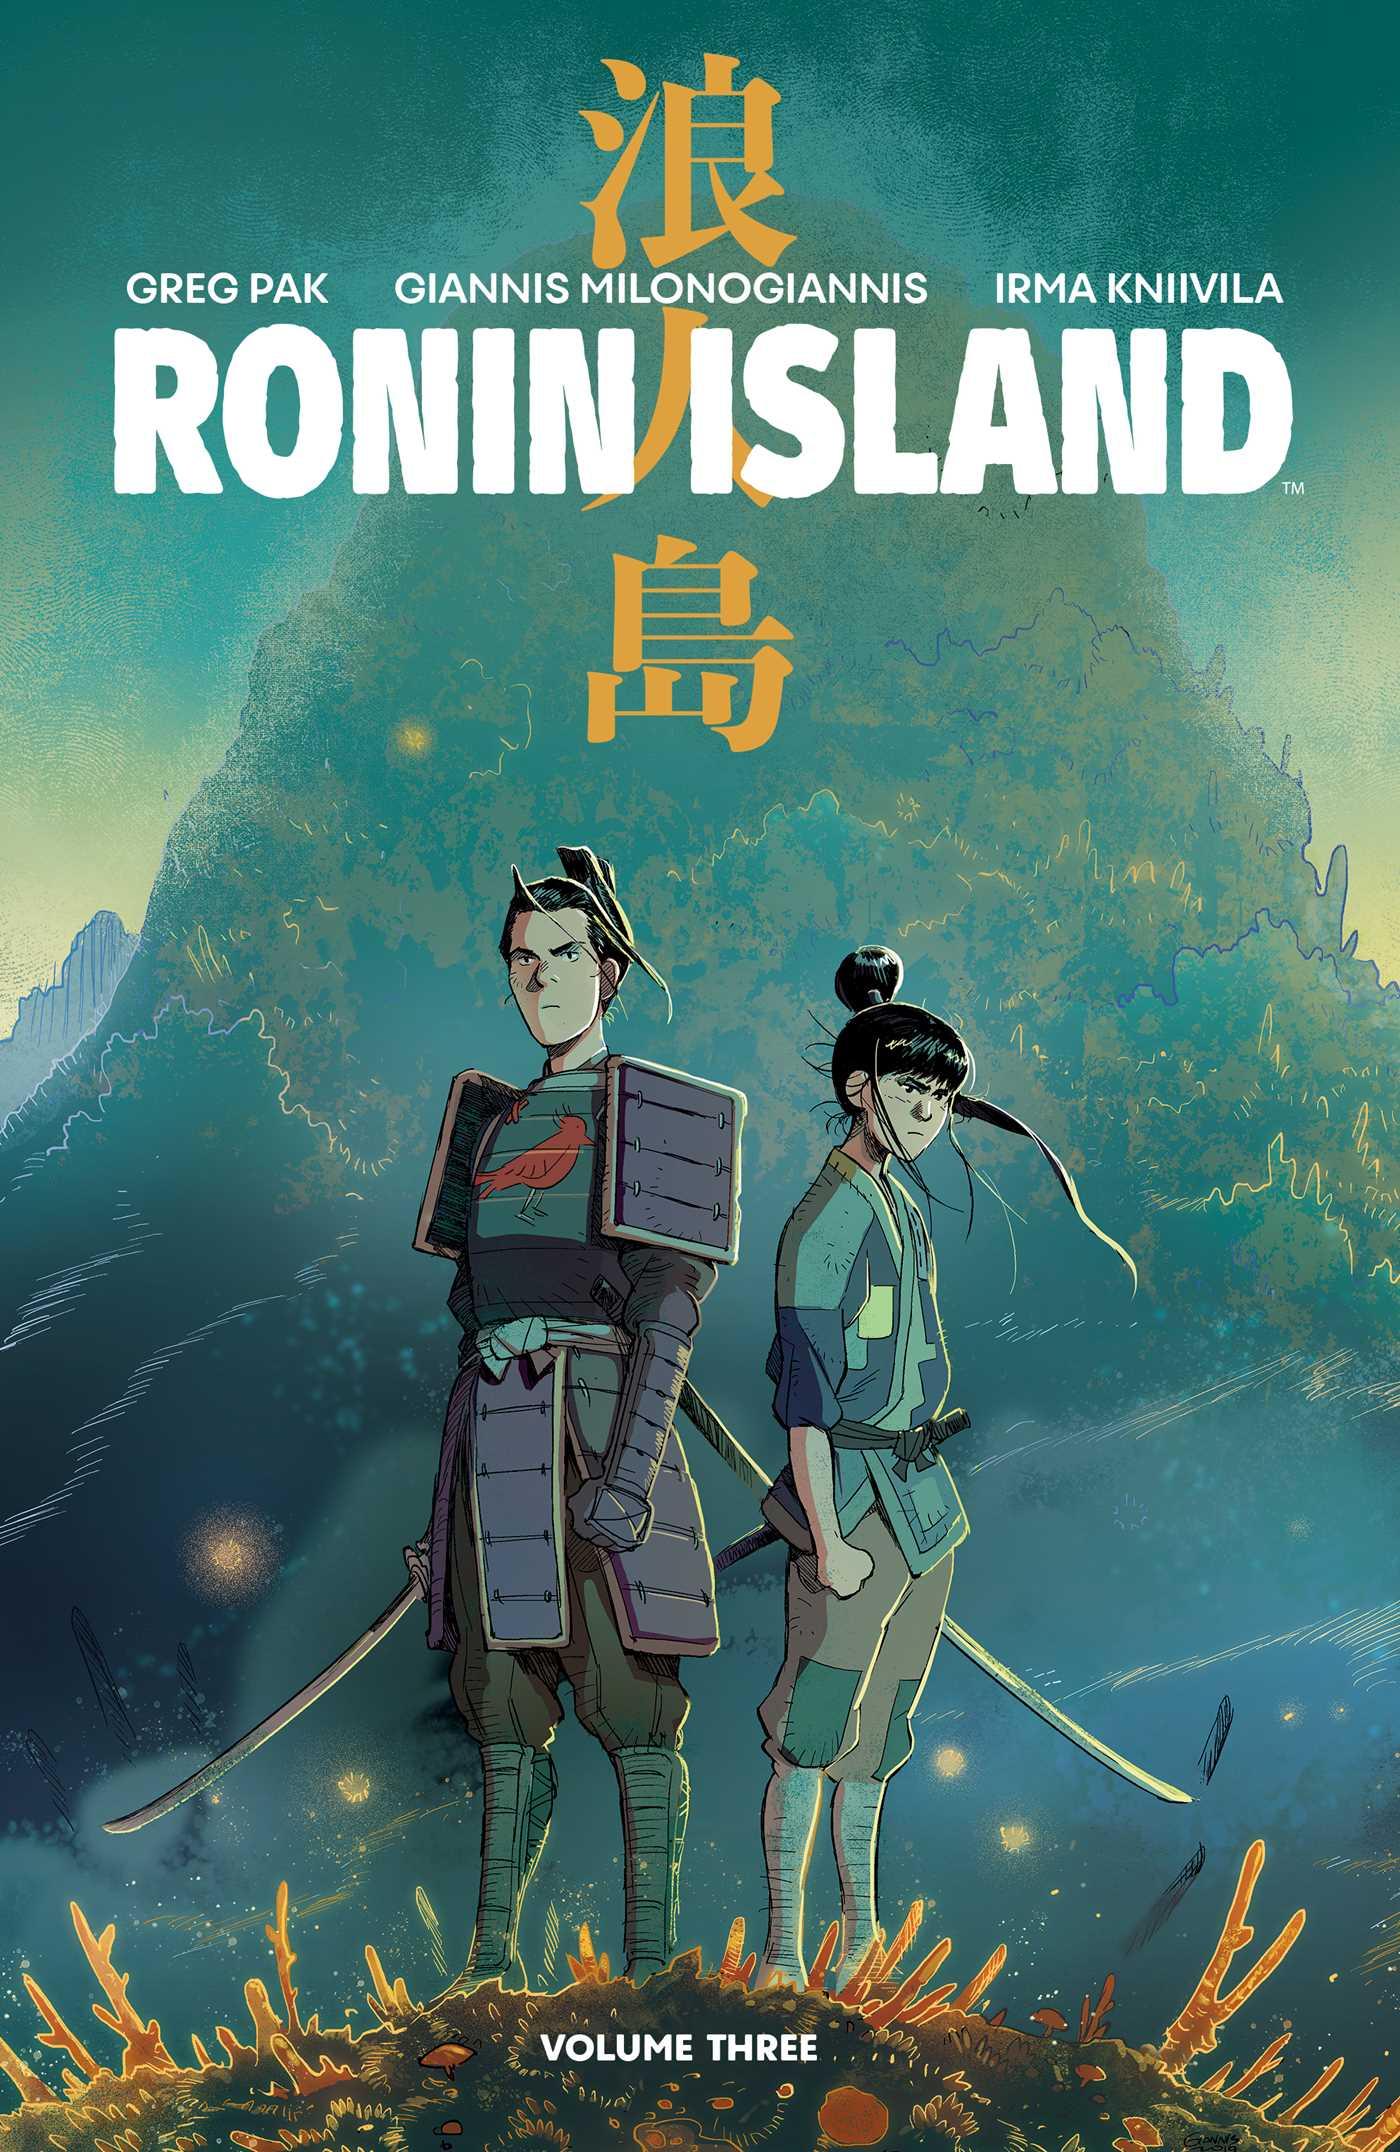 Ronin Island, Vol. 3